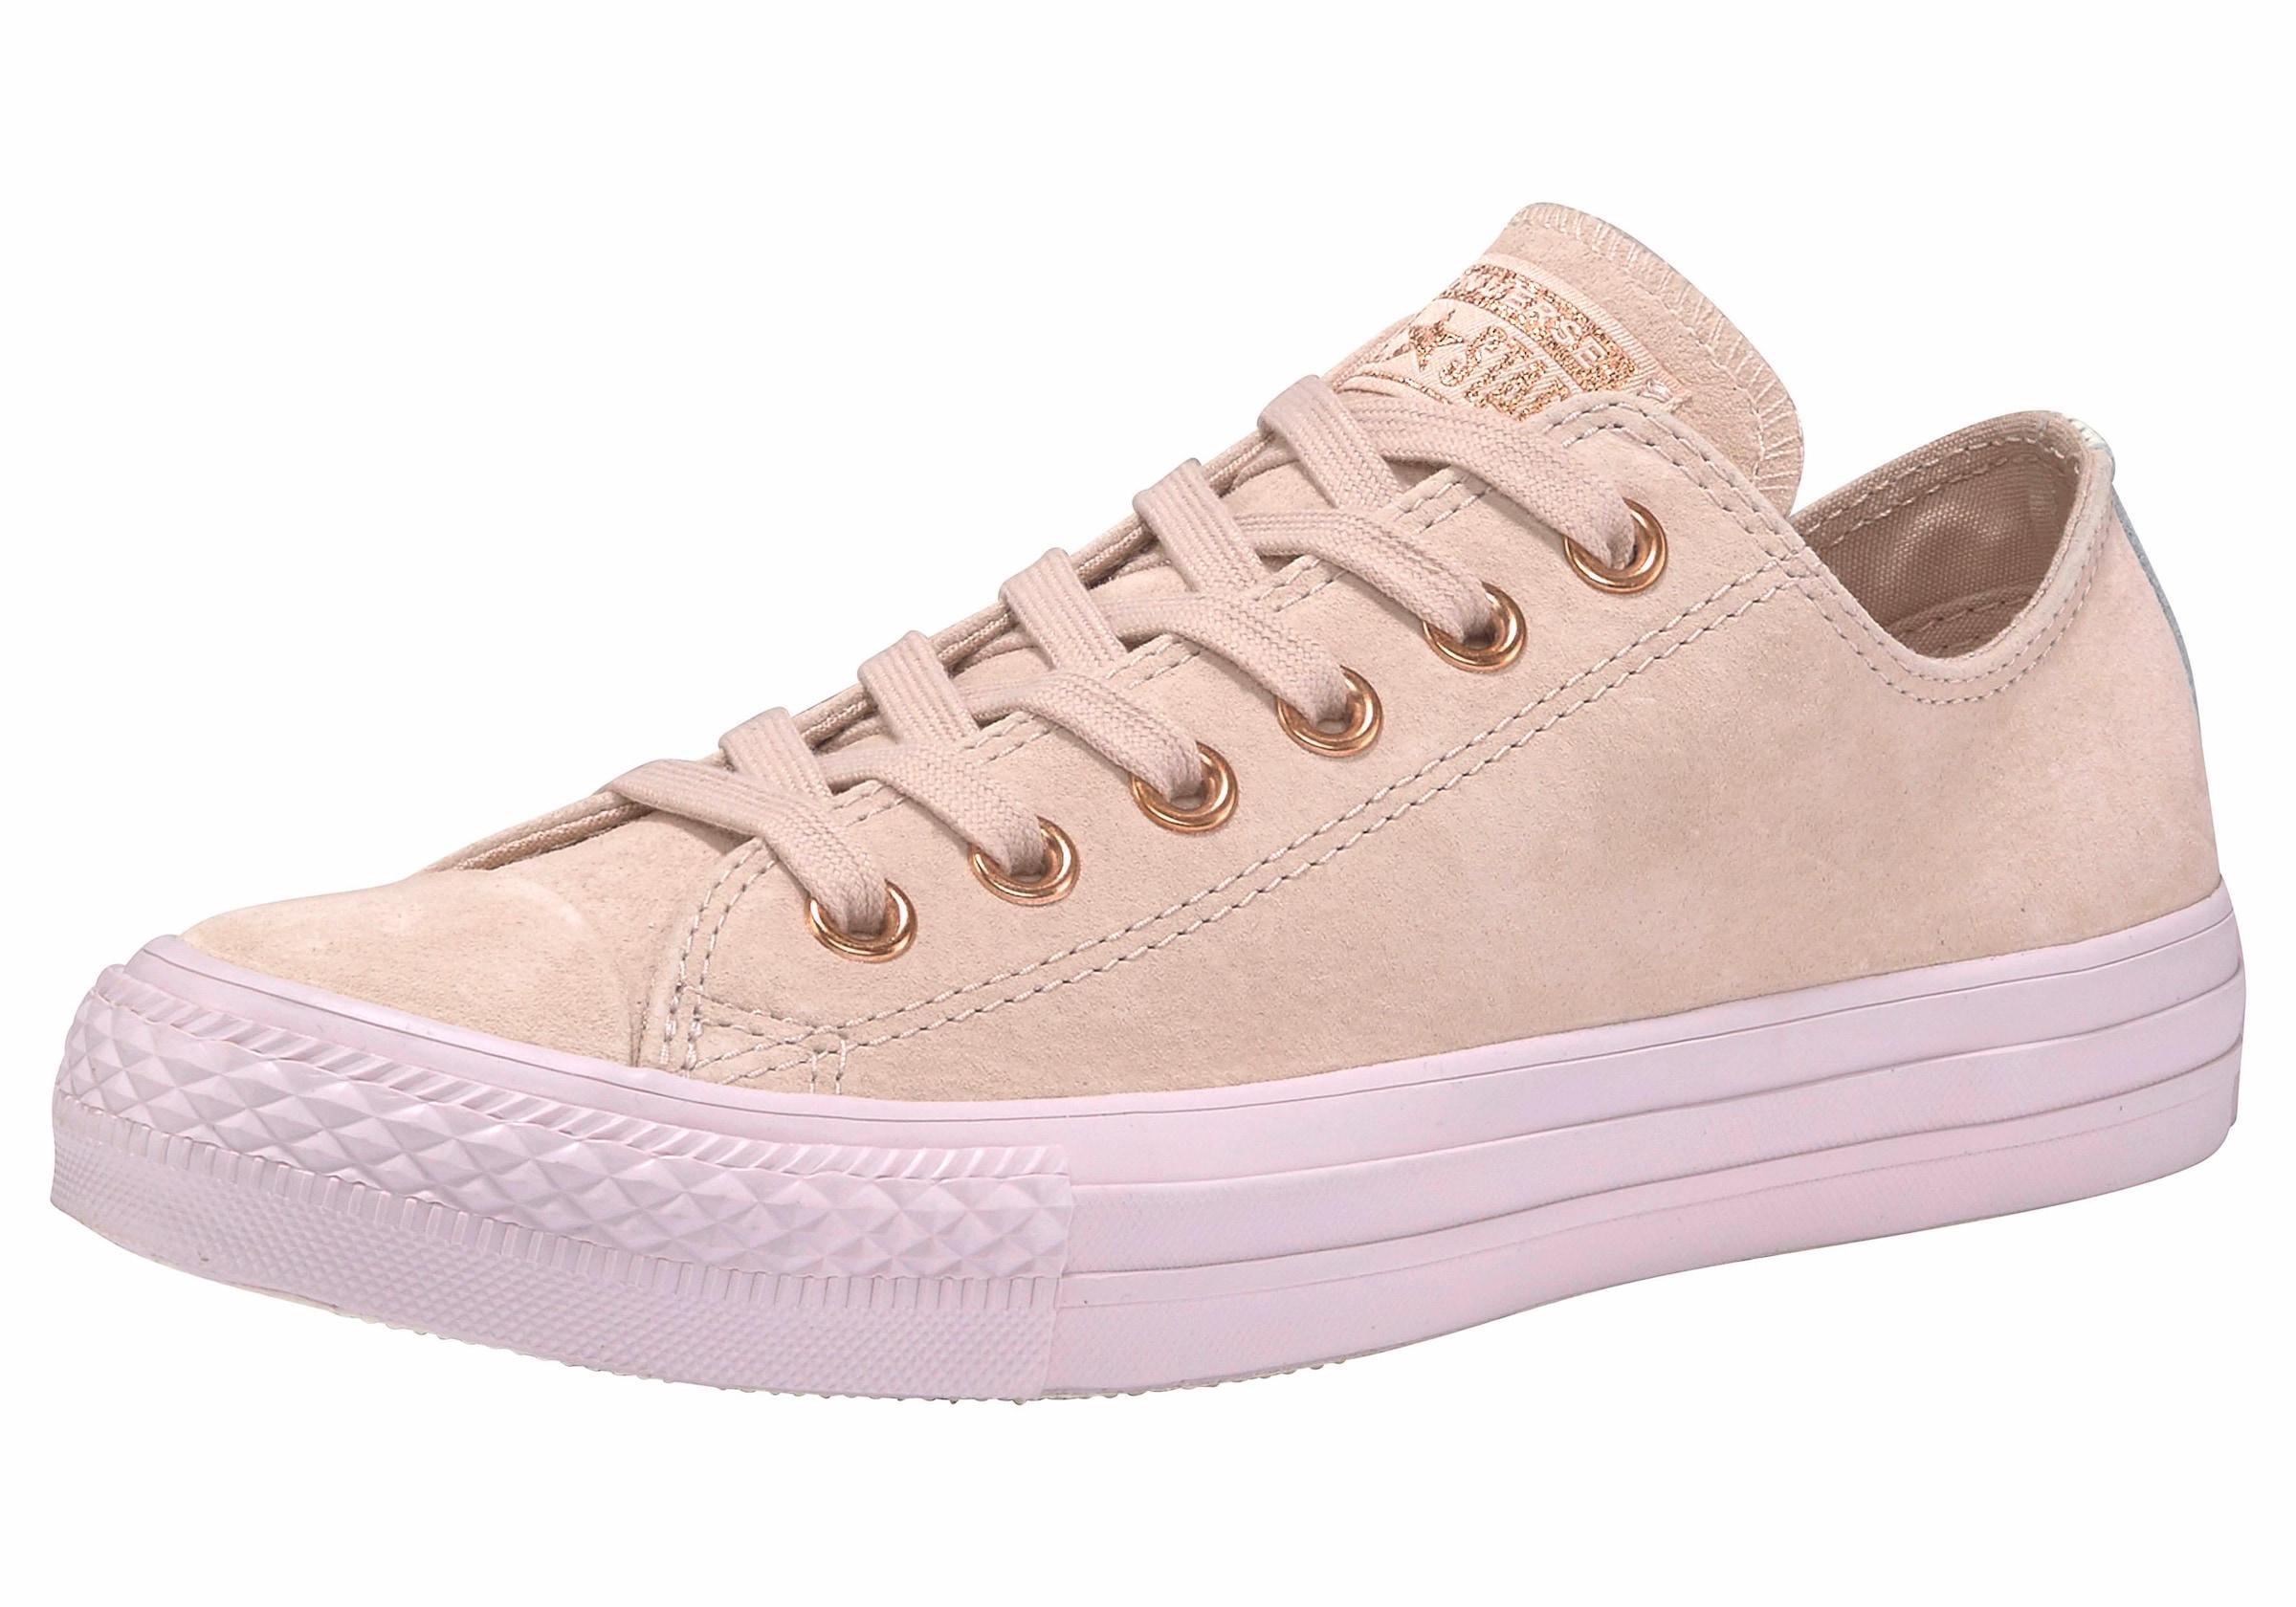 converse chuck taylor all star ox tonal suede sneaker